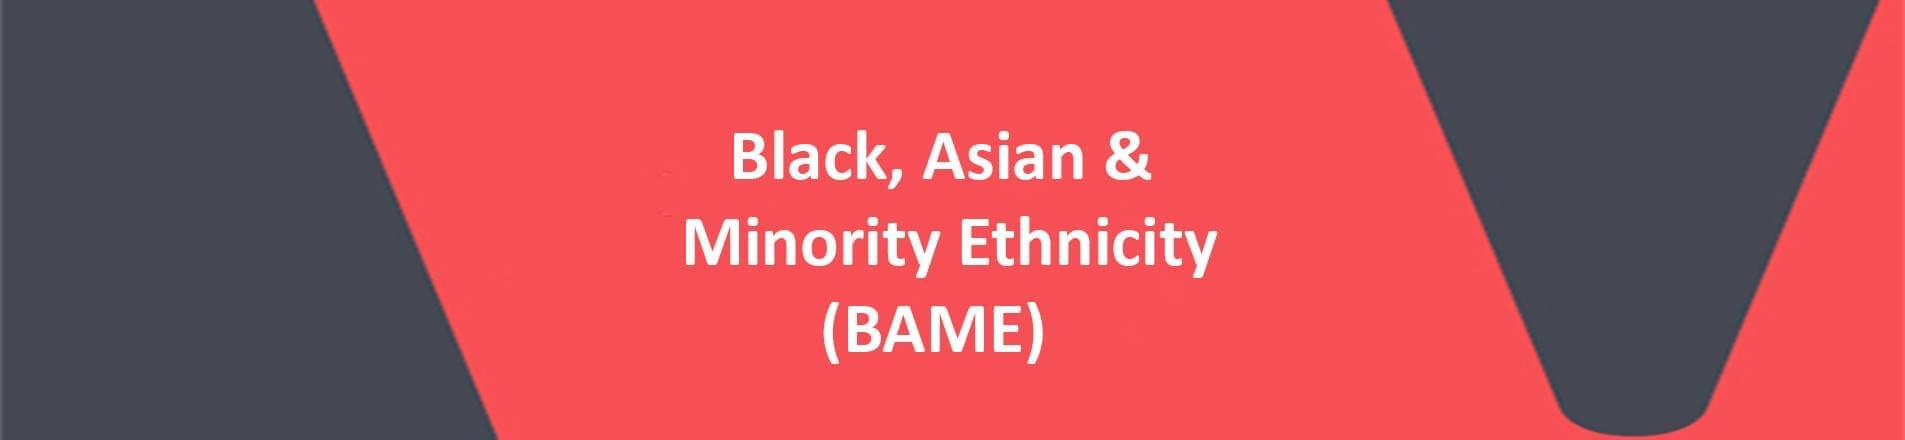 Image of the words black, asian & minority ethnicity